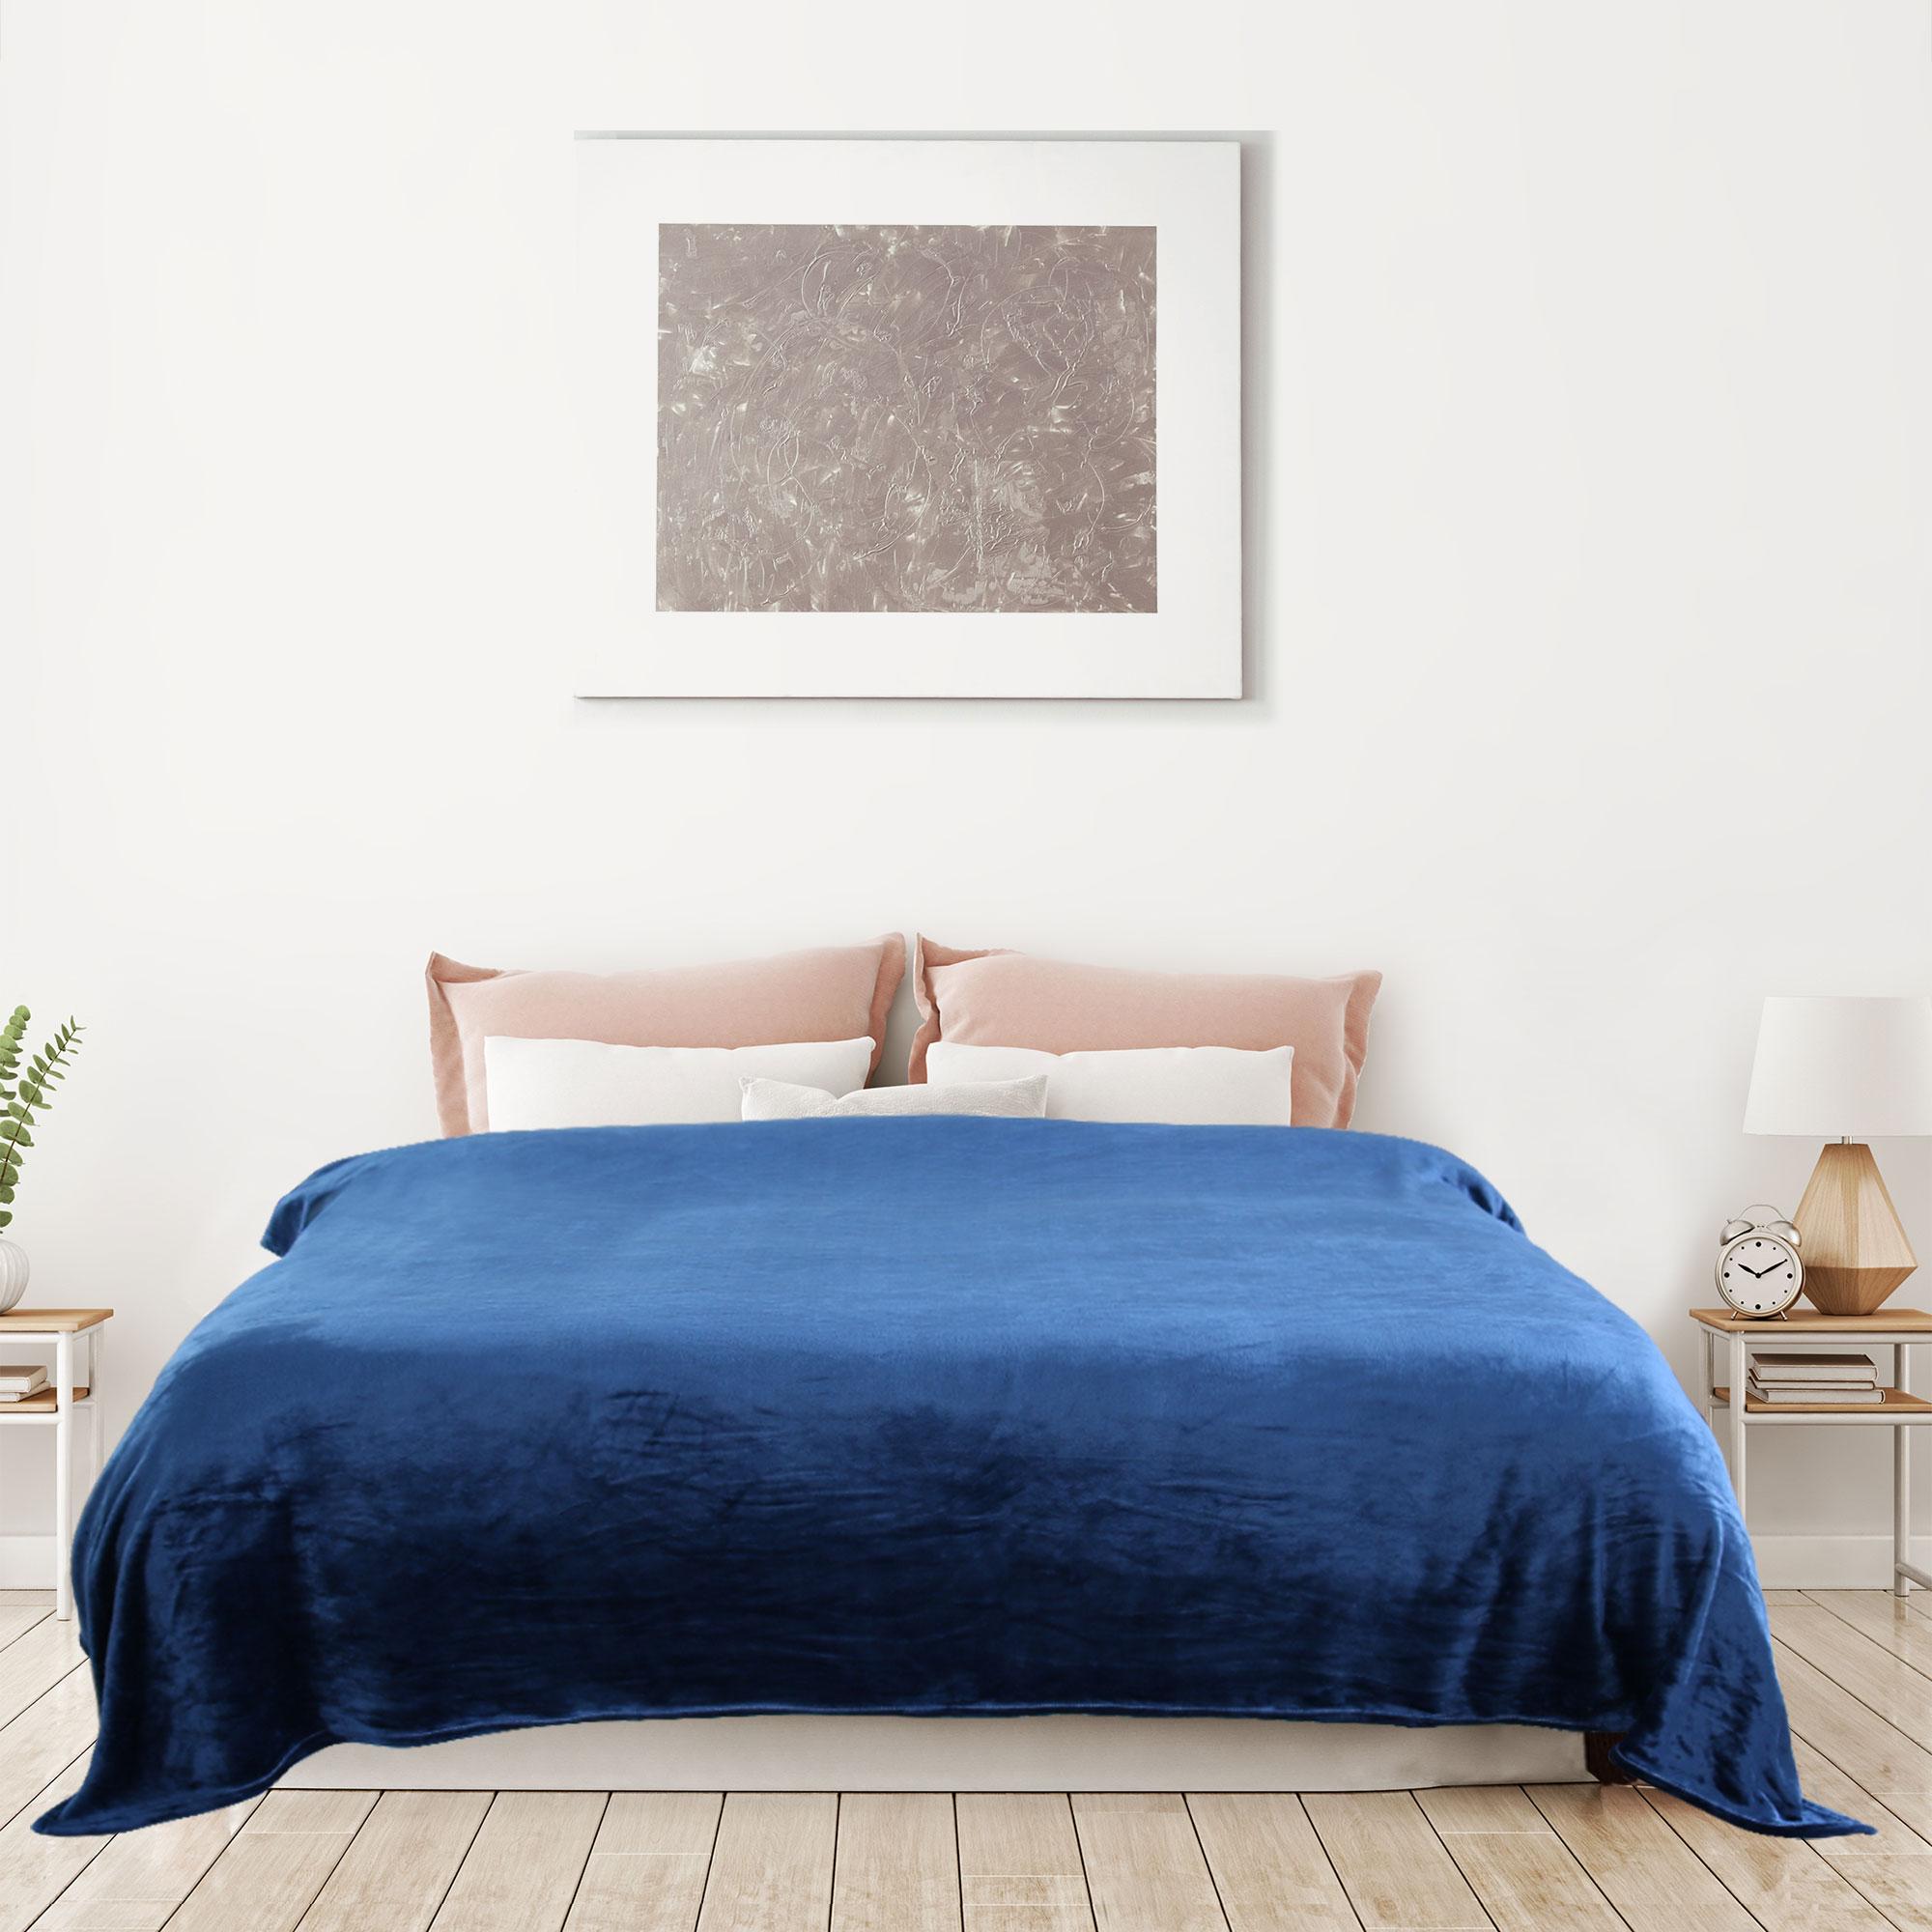 Solid Navy Blue Blanket Bedding Throw Flannel King Super Soft Warm Best Value